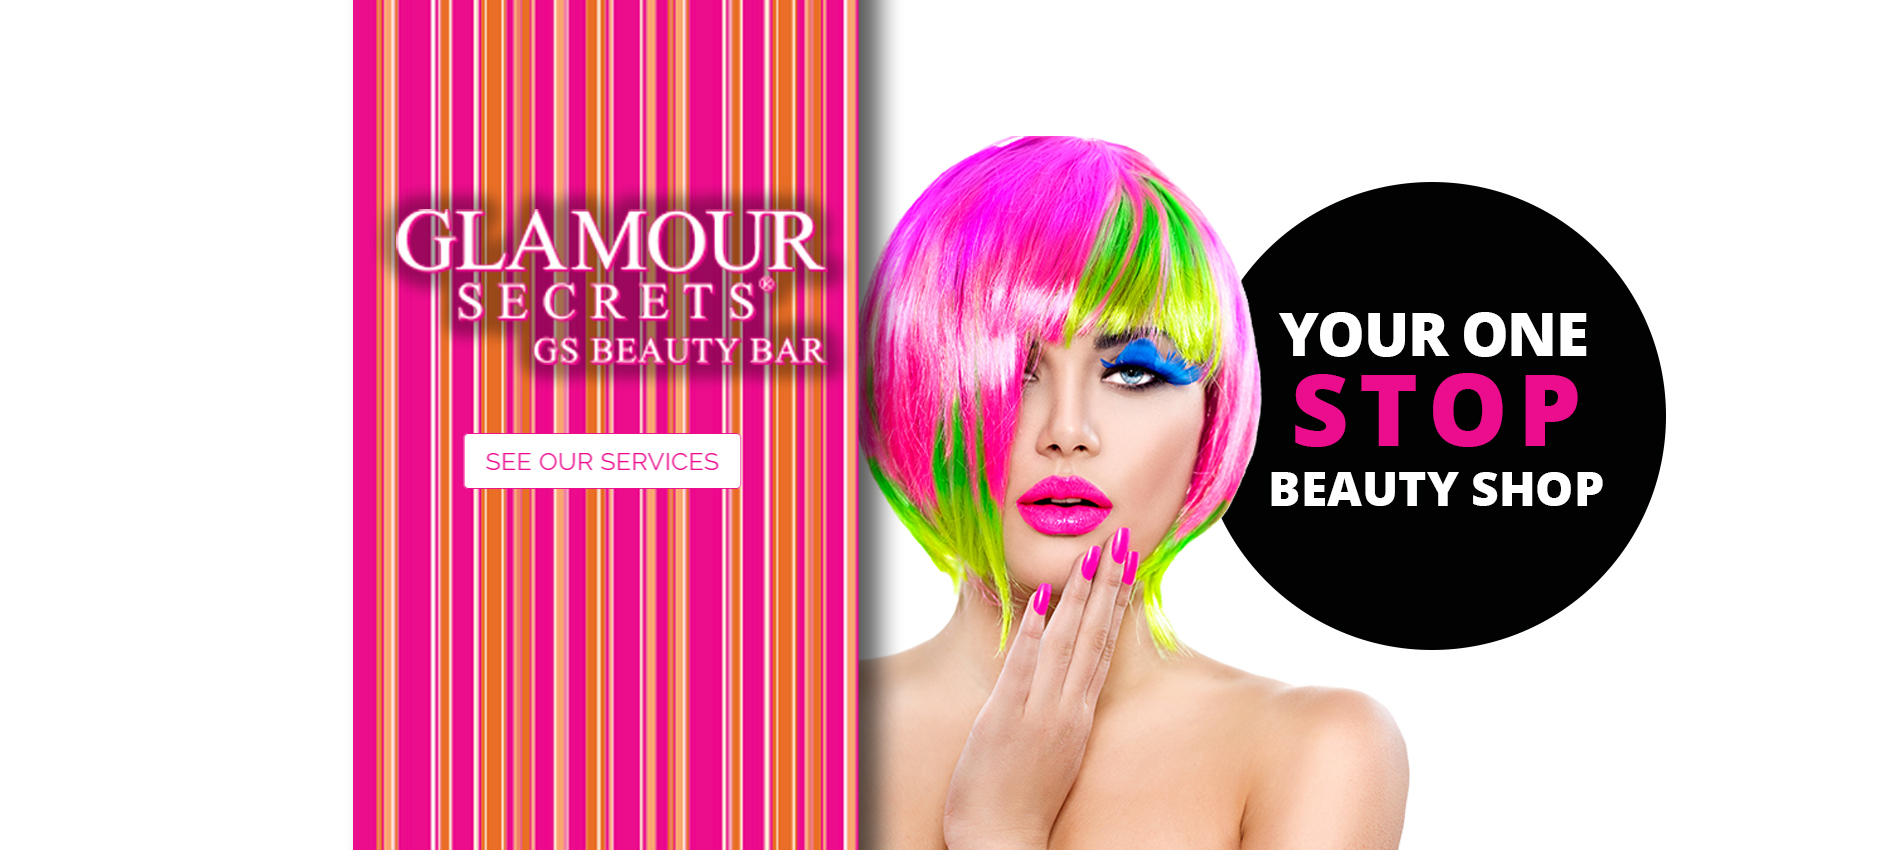 Glamour secrets chilliwack